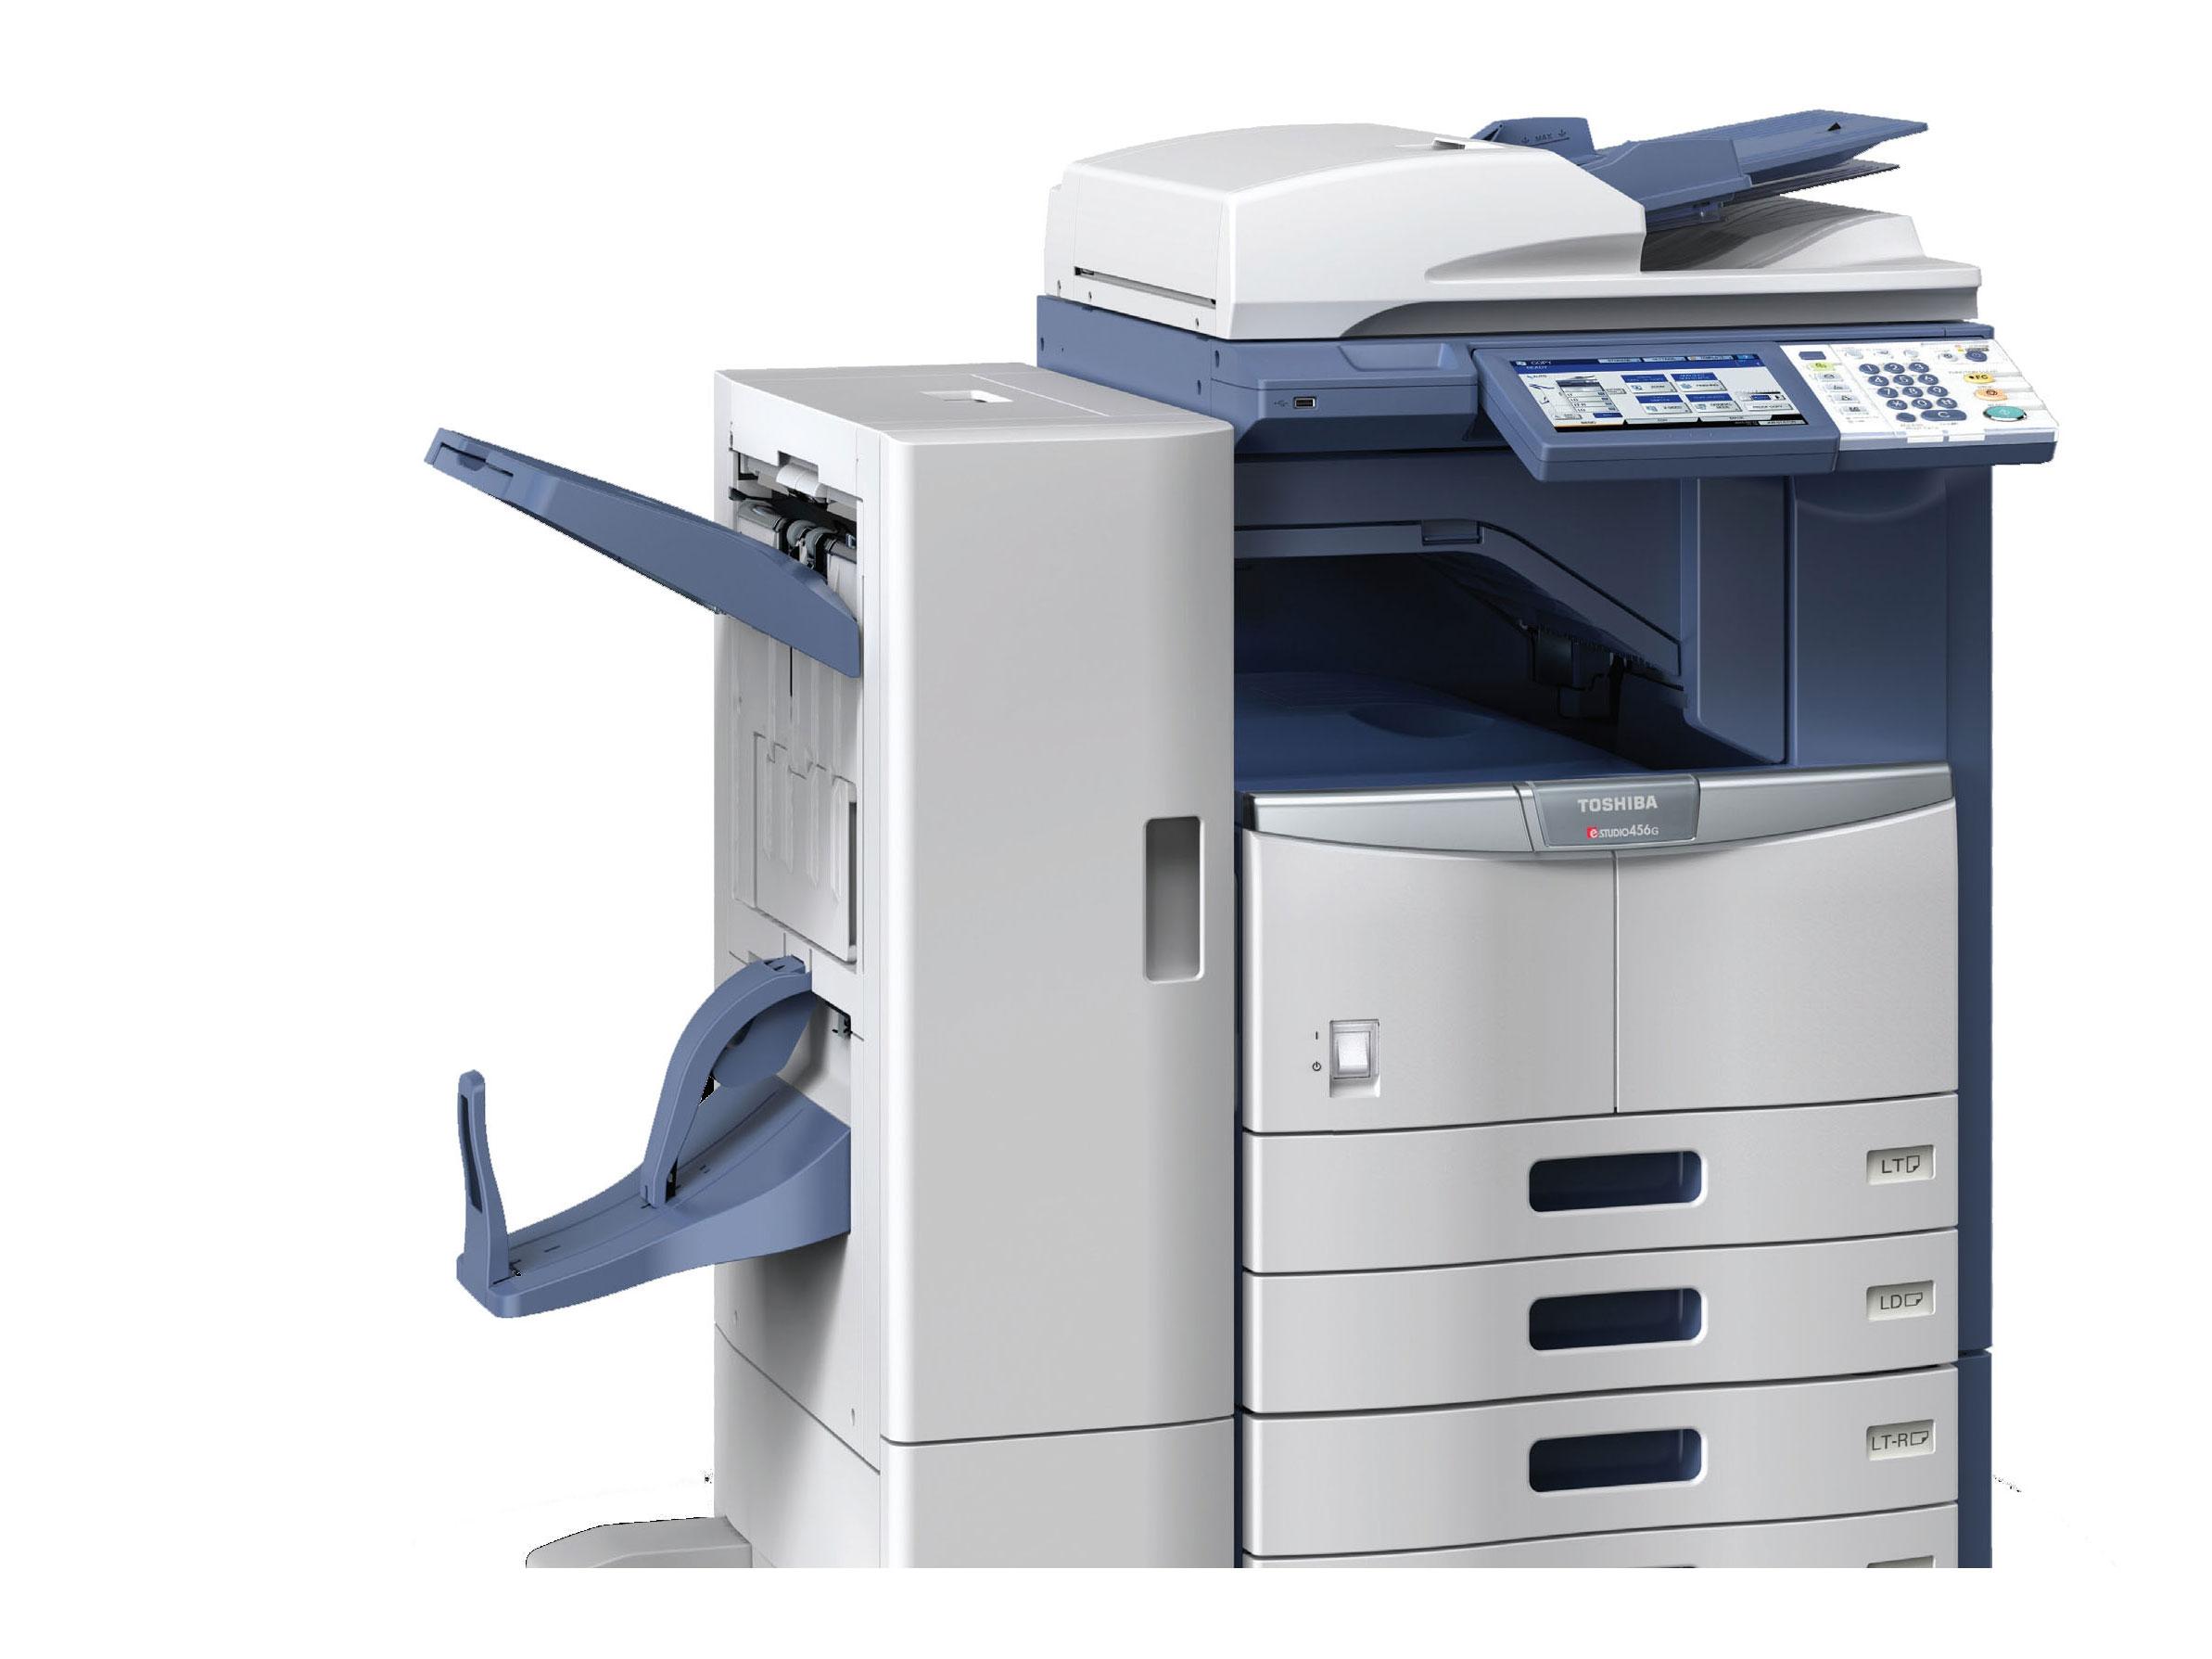 Fotocopiadora Toshiba e-STUDIO 456G Barata